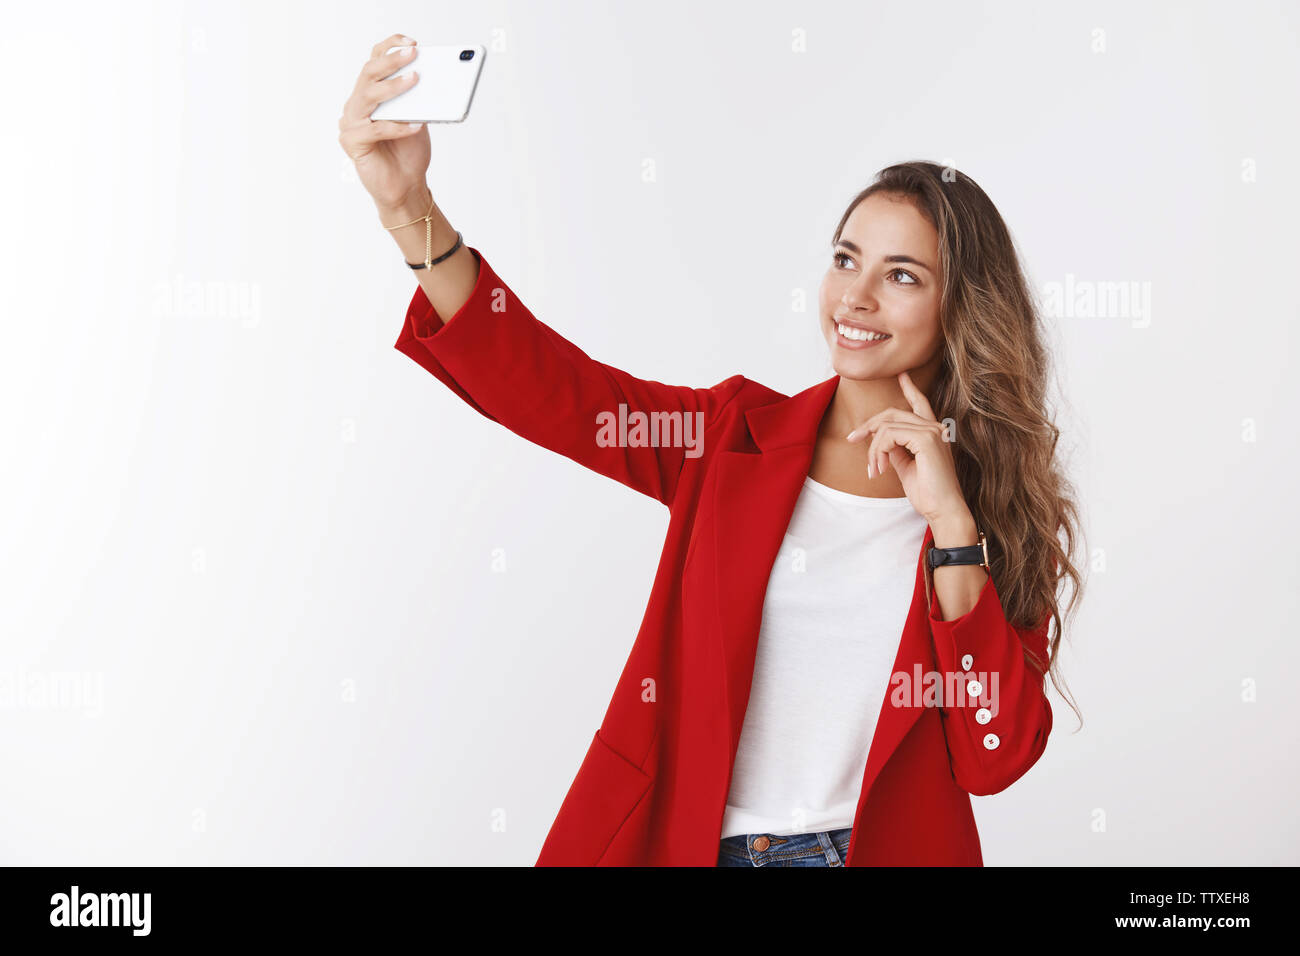 Charming modern female office employee taking selfie posting online blog telling followers new job, extending hand holding smartphone photographing - Stock Image